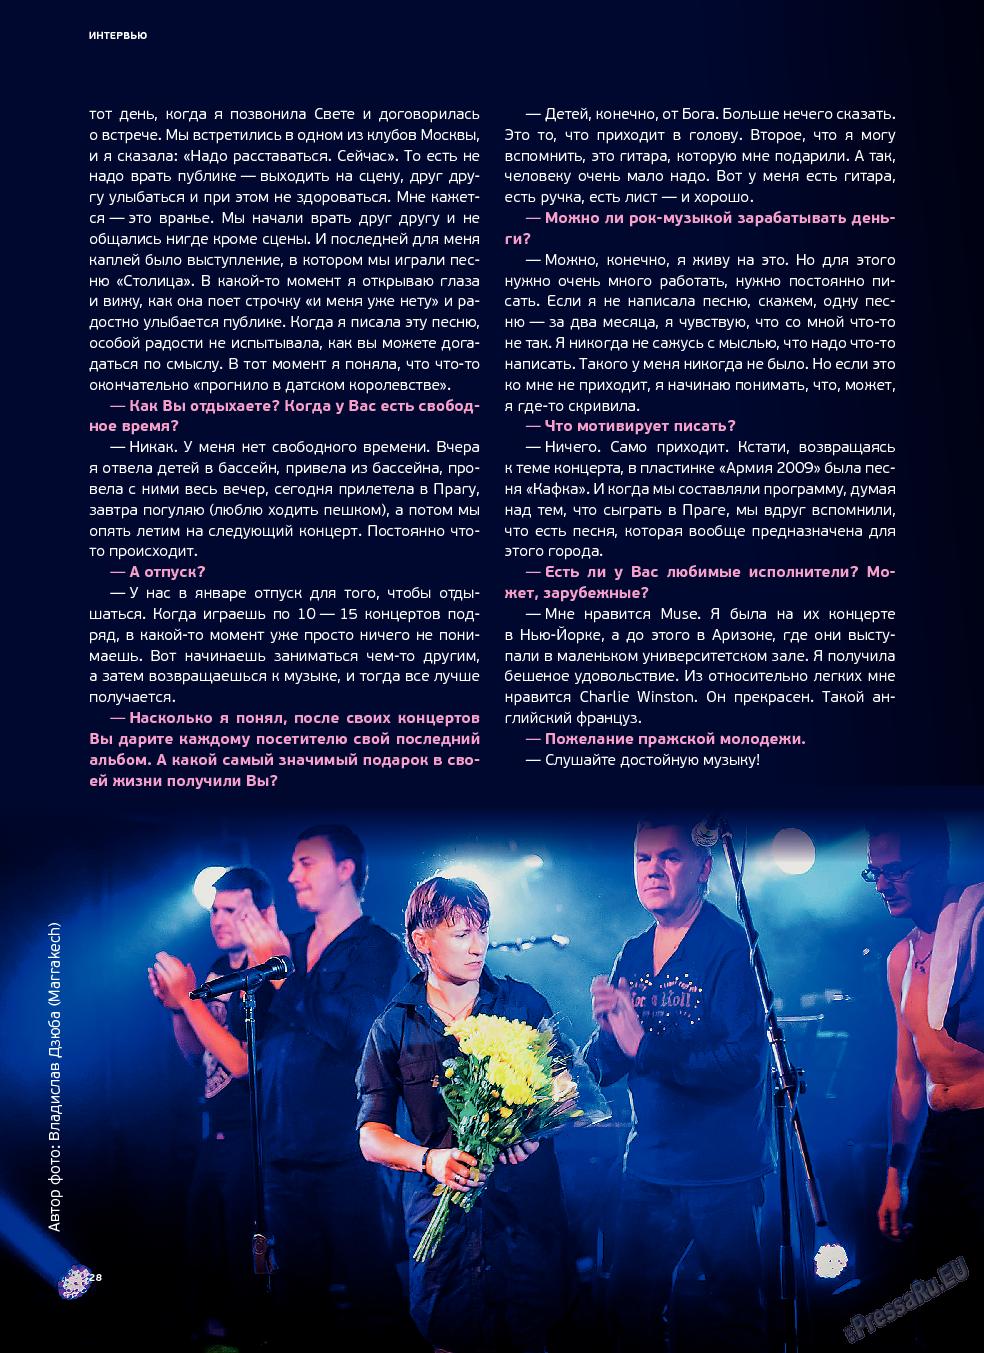 Артек (журнал). 2013 год, номер 2, стр. 30